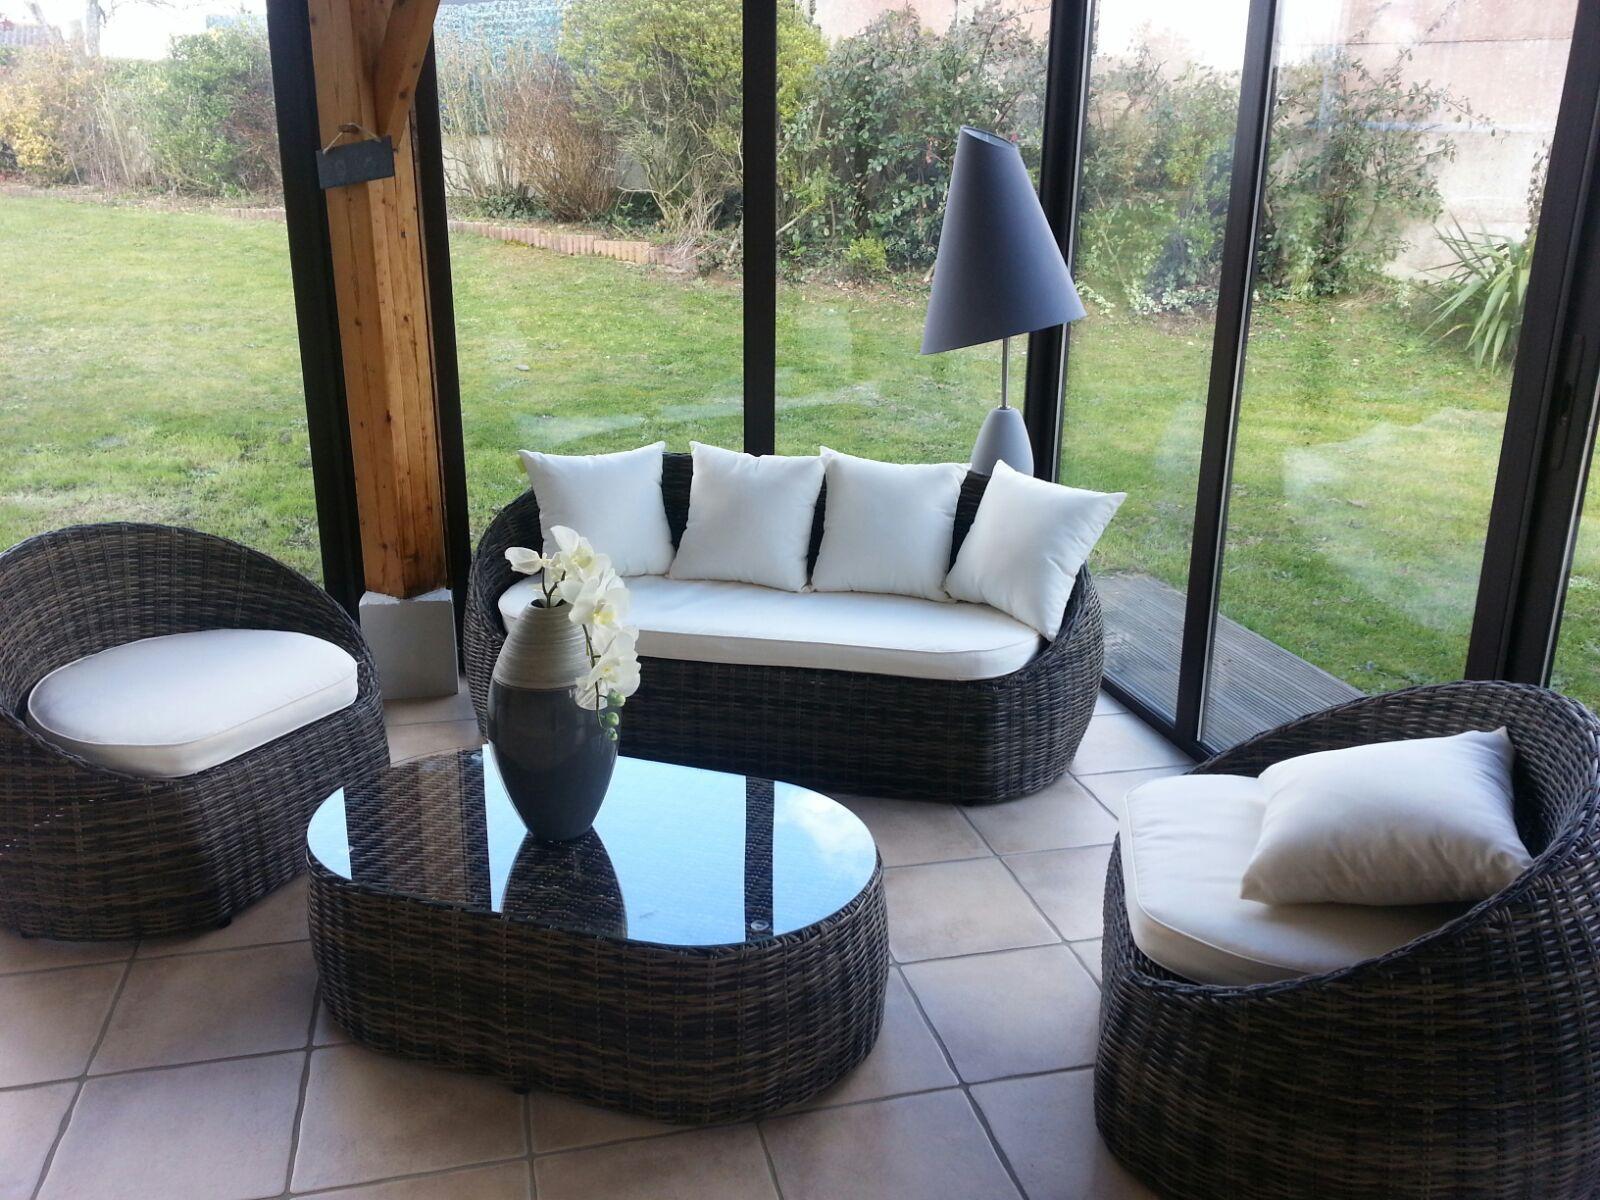 Salon de jardin resine promo - Jardin piscine et Cabane